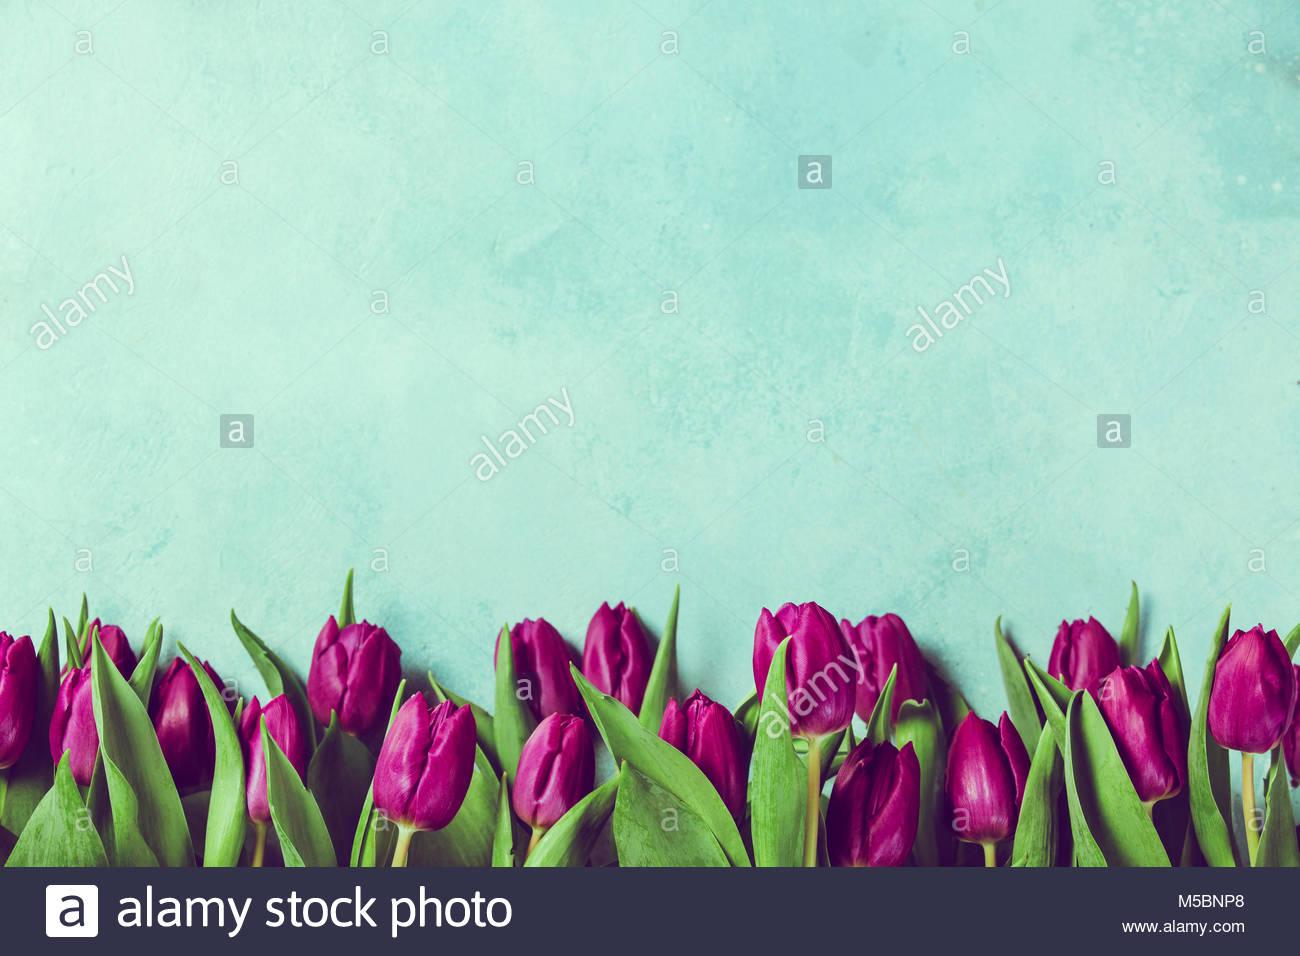 Purple tulips border fresh spring flowers on rustic blue background purple tulips border fresh spring flowers on rustic blue background with copy space mightylinksfo